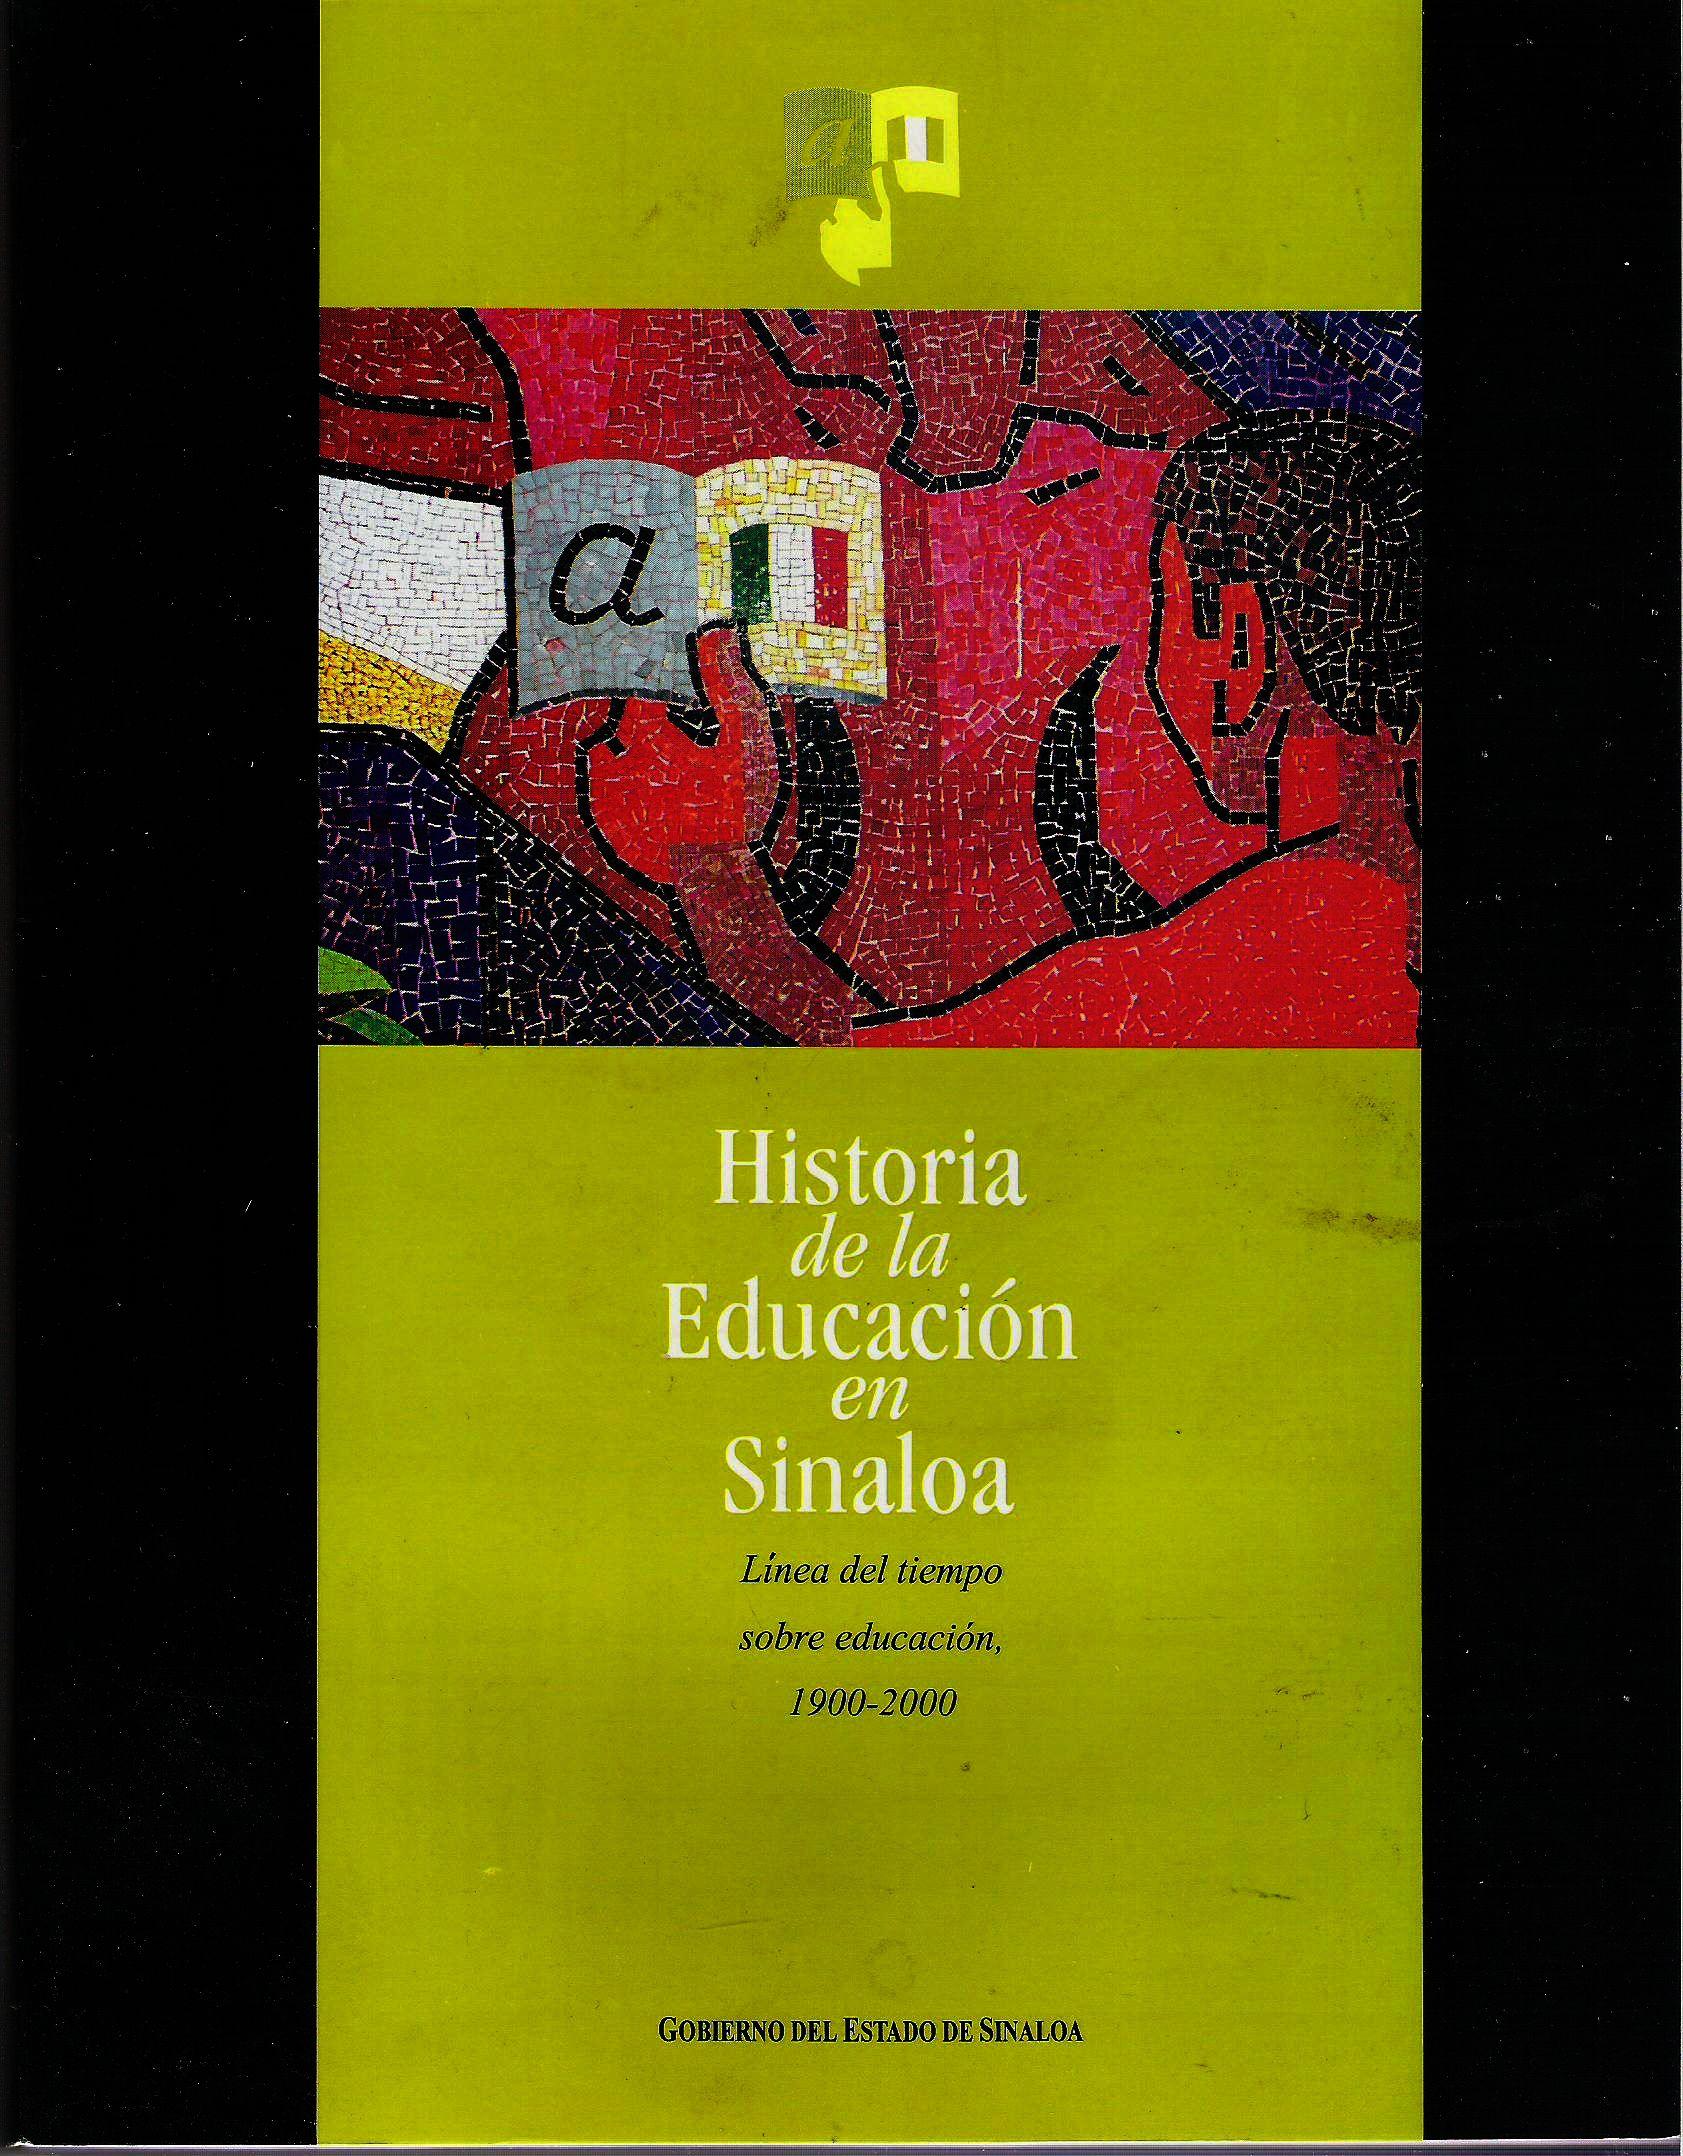 Historia de la educaci¢n en Sinaloa